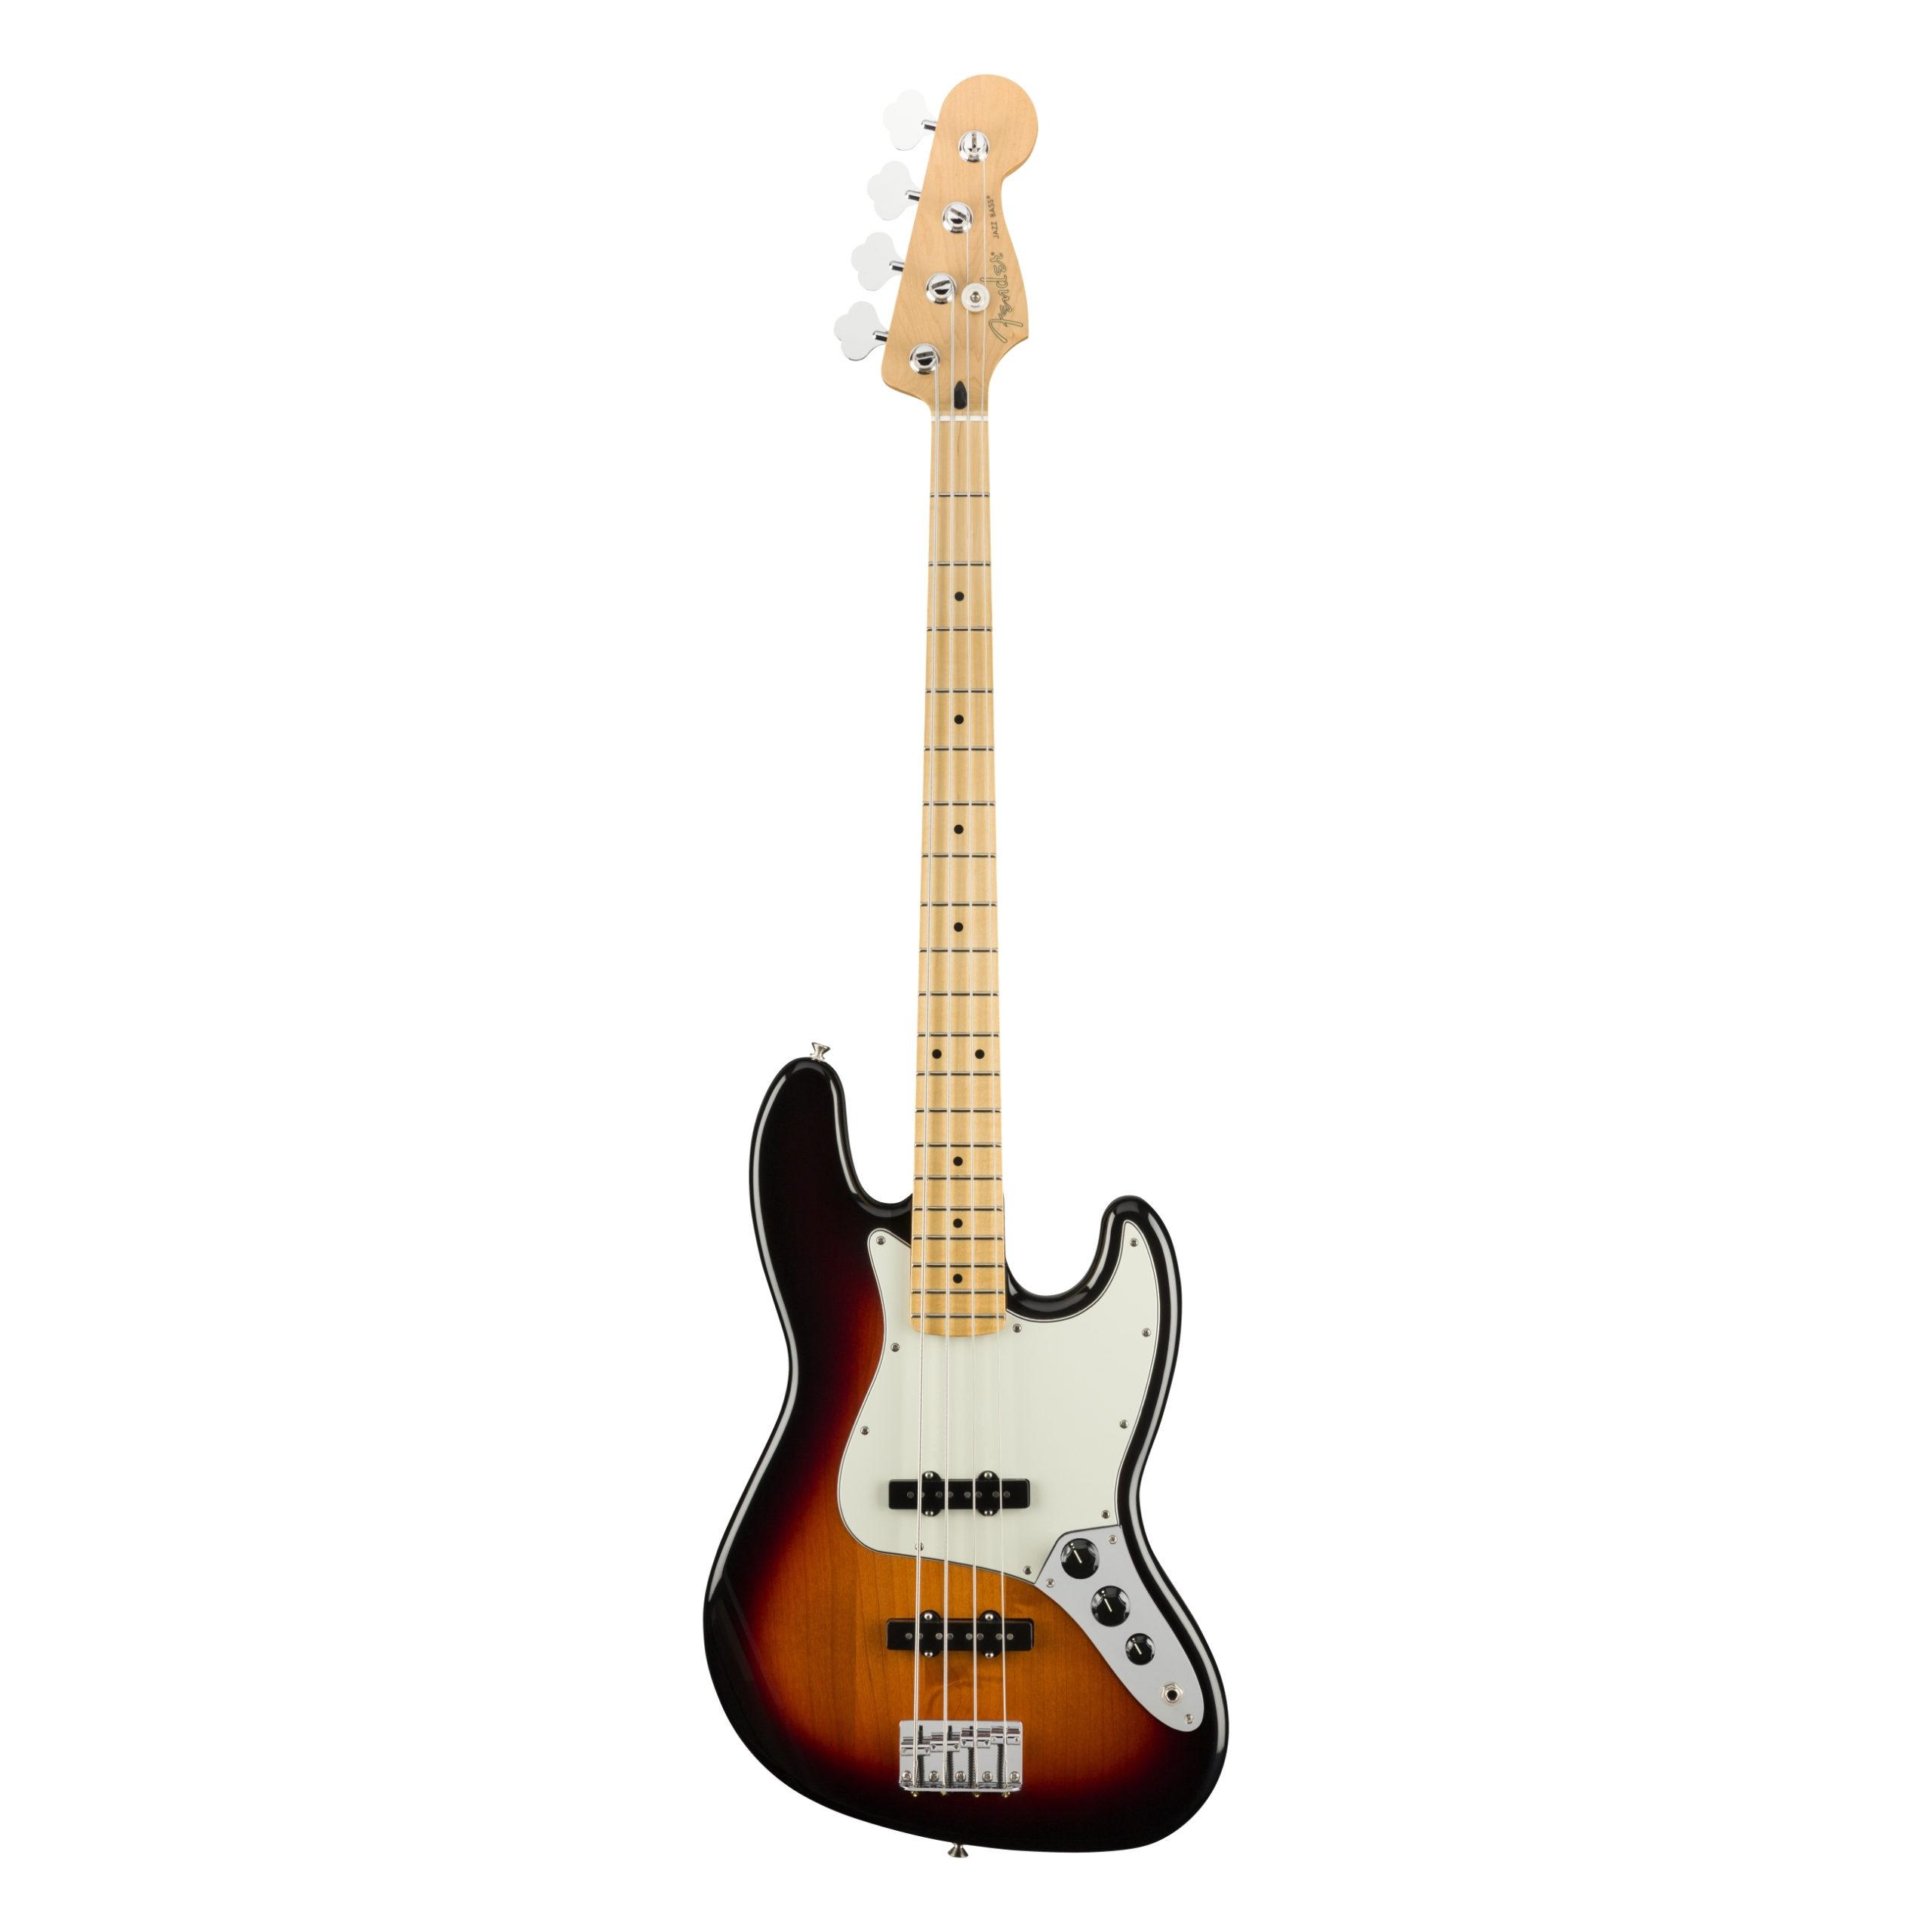 Fender Player Jazz Bass®, Maple Fingerboard, 3-Color Sunburst